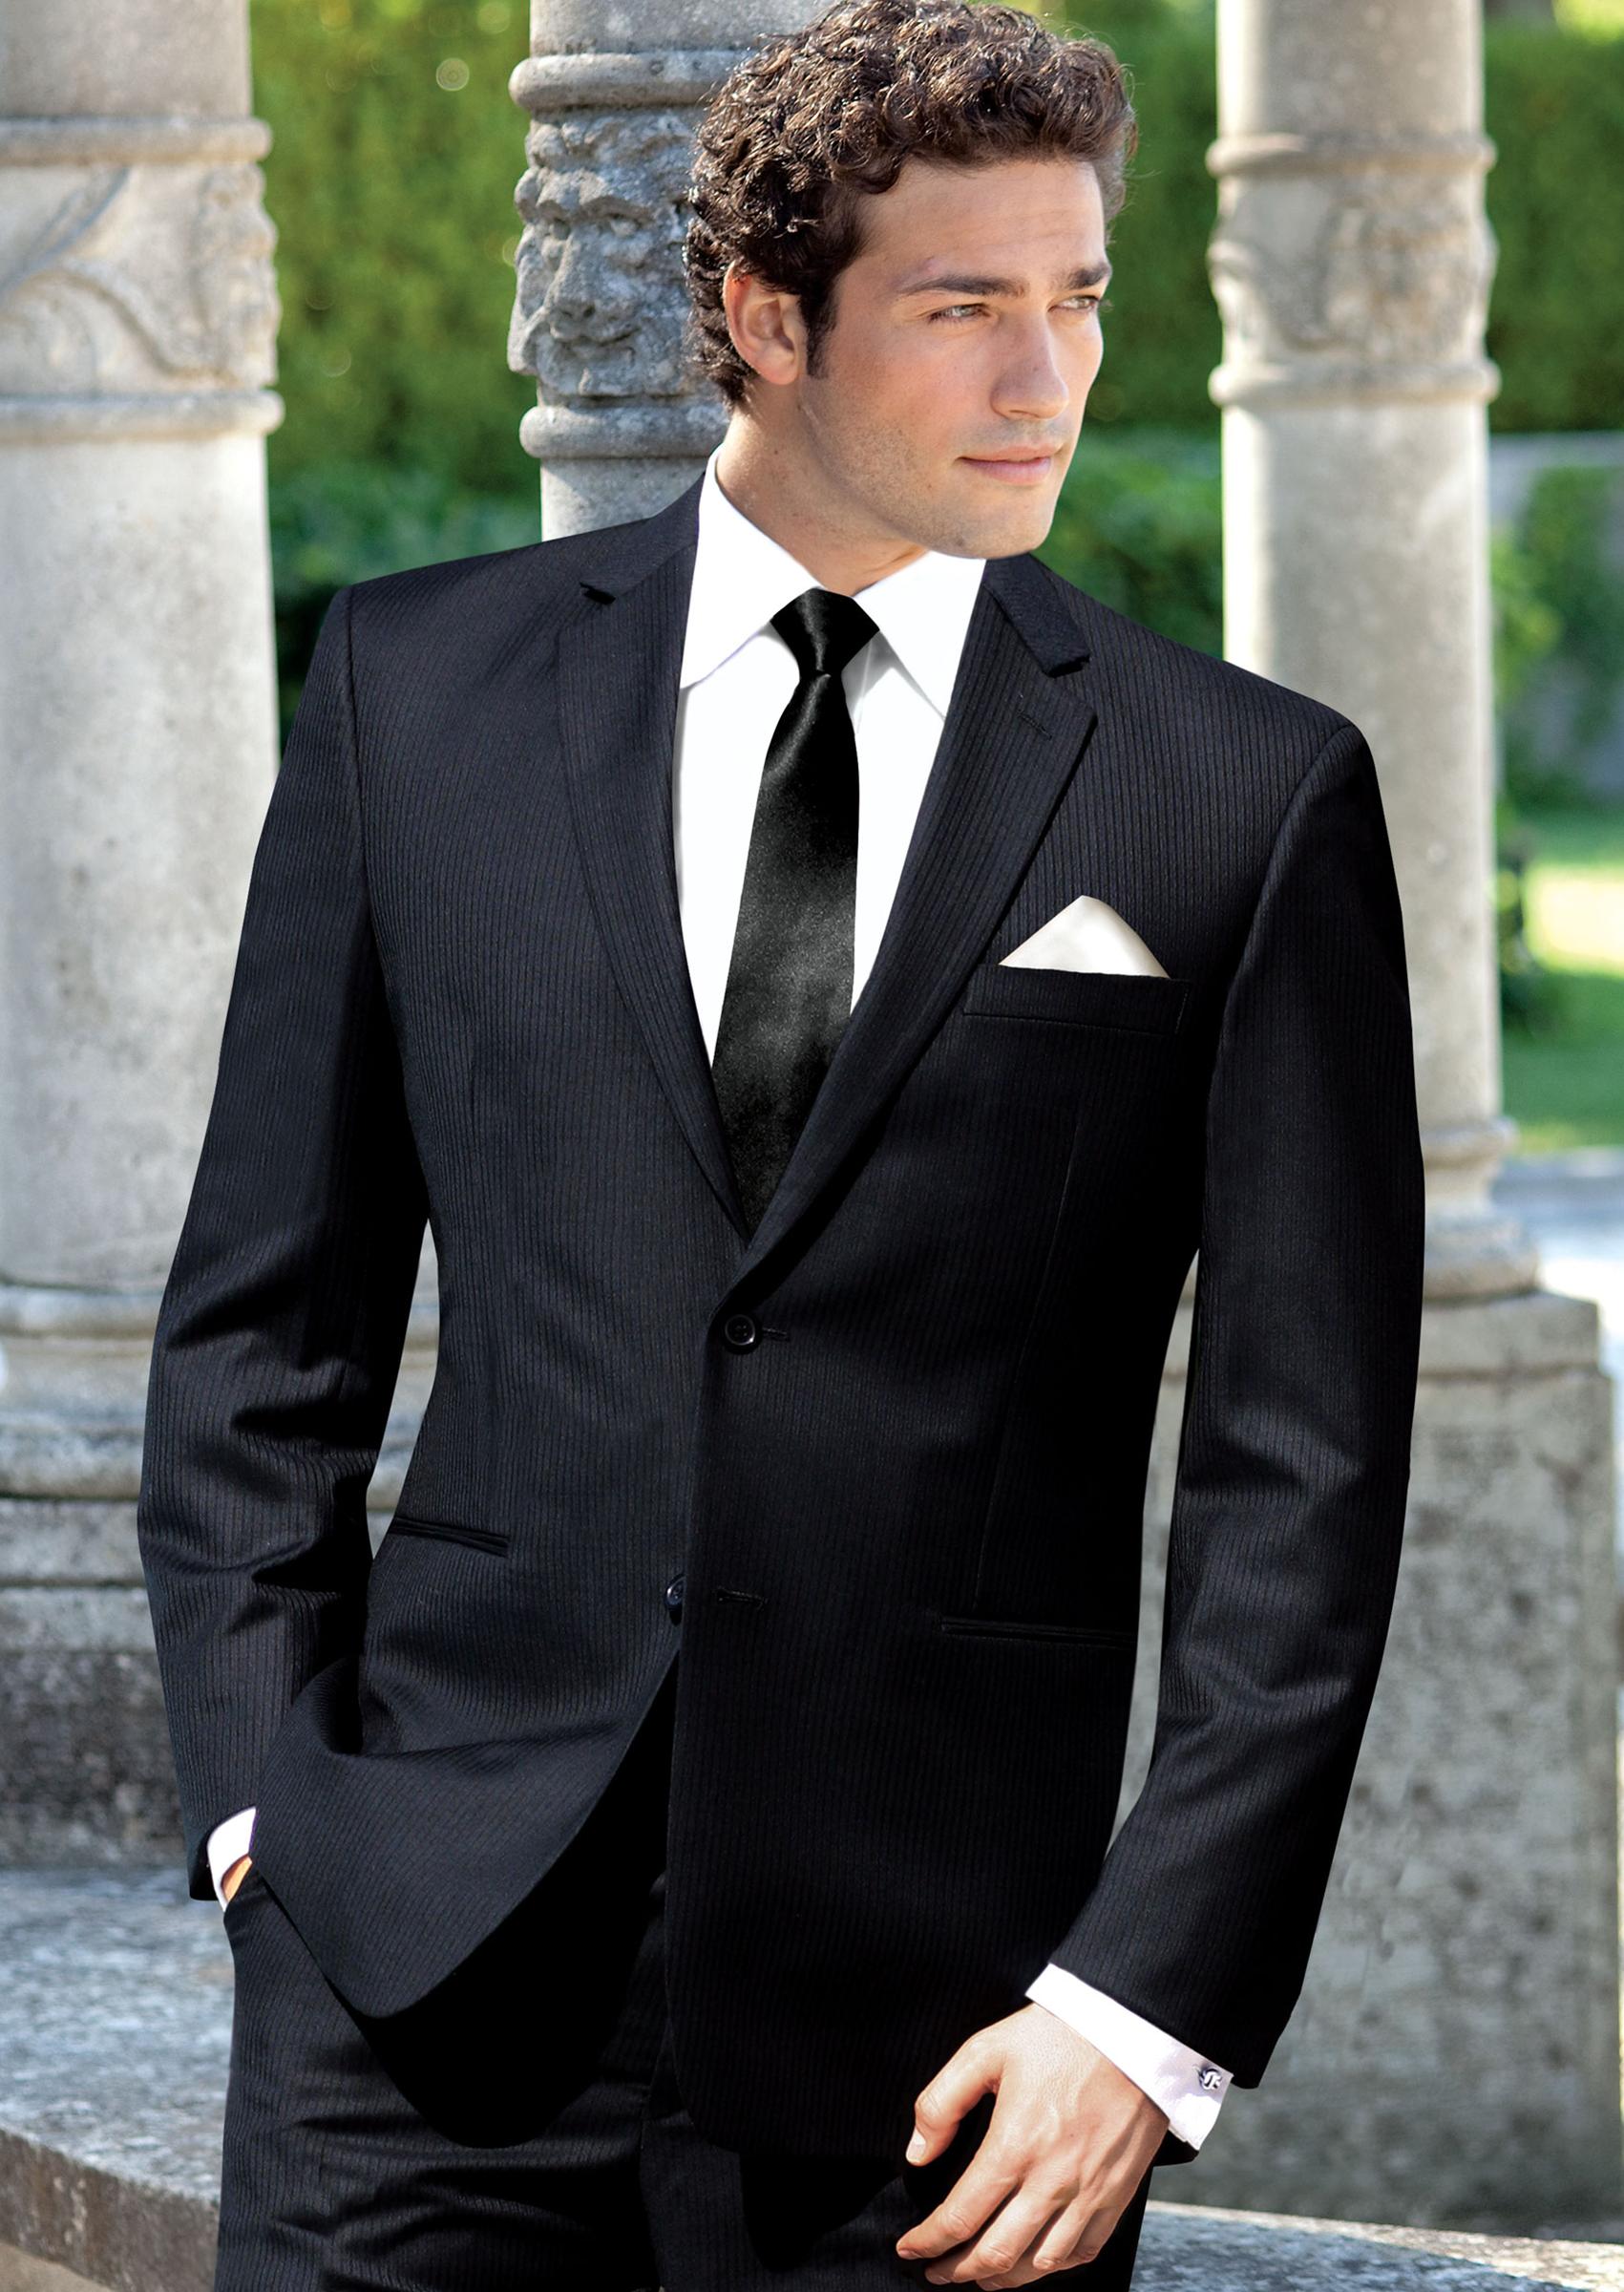 Black Madison | Suits | Pinterest | Rent tuxedo, Perry ellis and ...